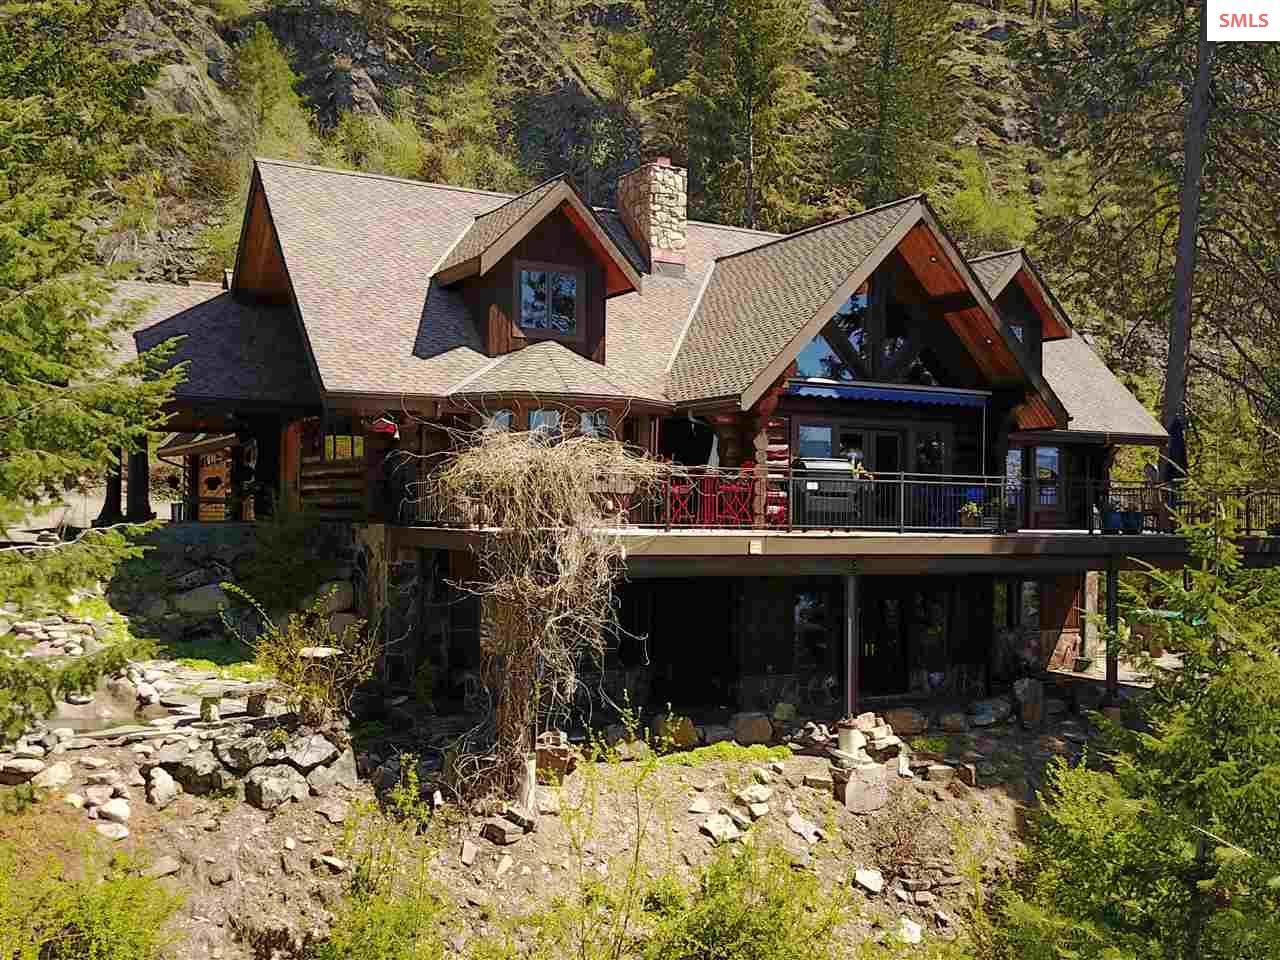 Single Family Home for Sale at 179 Artemis 179 Artemis Hope, Idaho 83836 United States